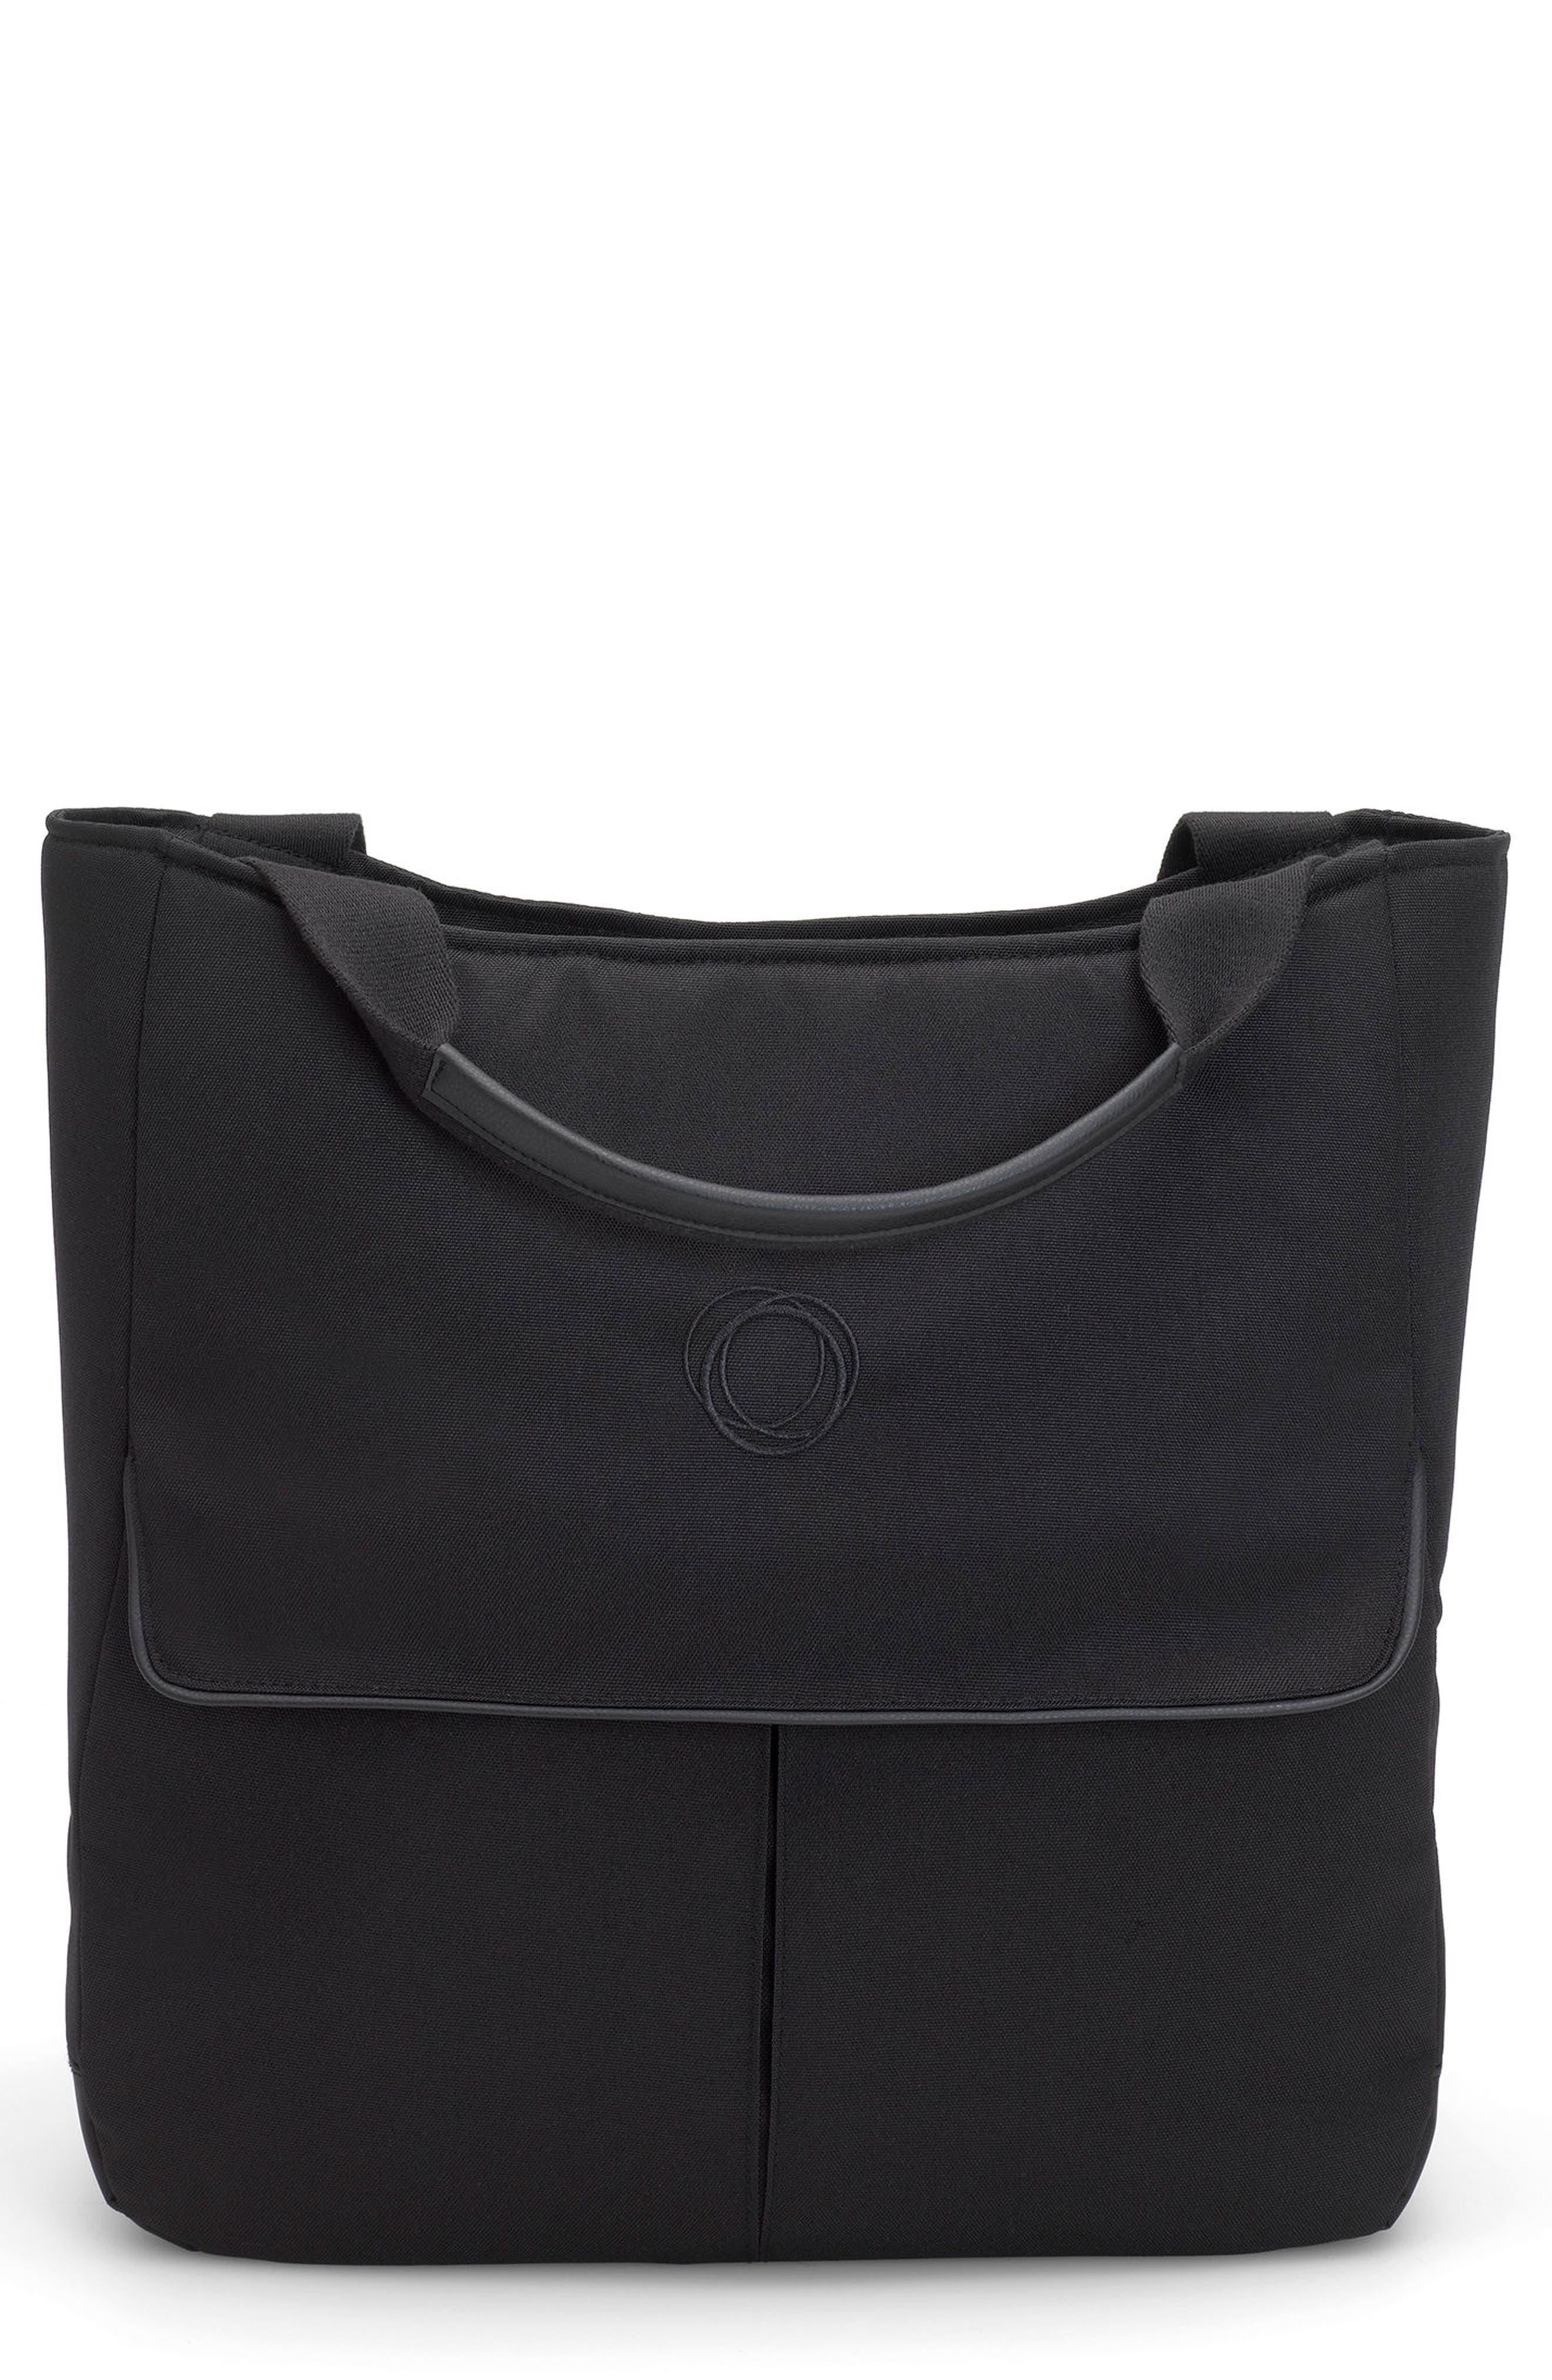 Mammoth Stroller Organizer Bag,                         Main,                         color, Black